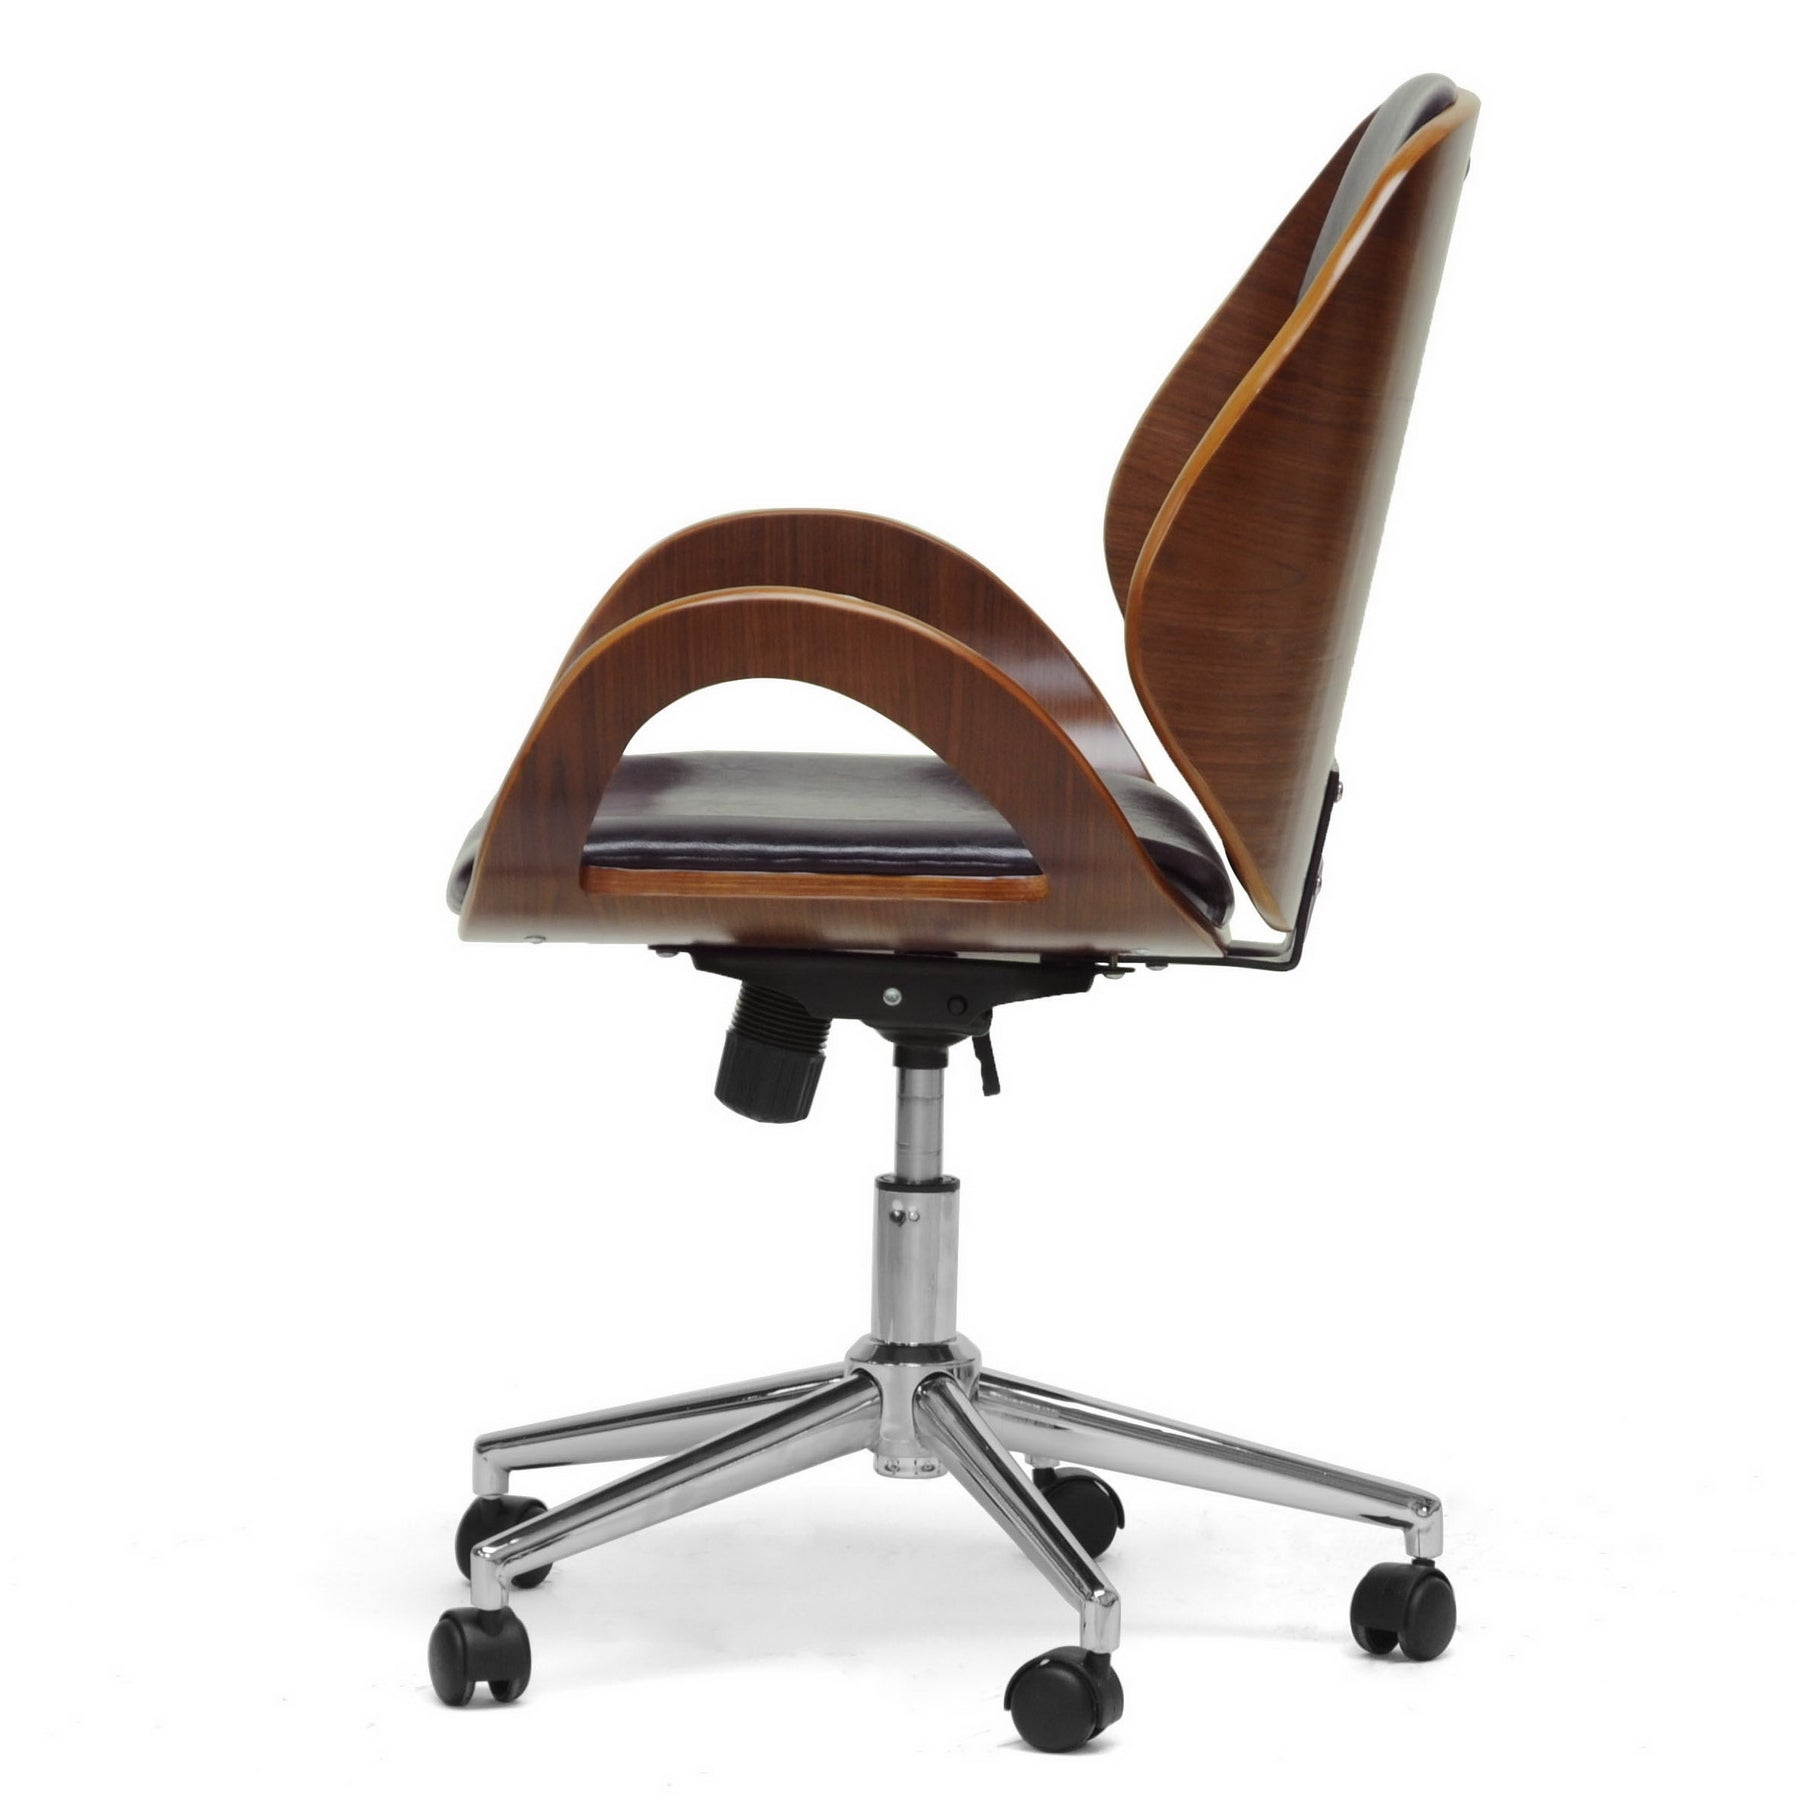 model max modern obj ixevprhb fbx office chair